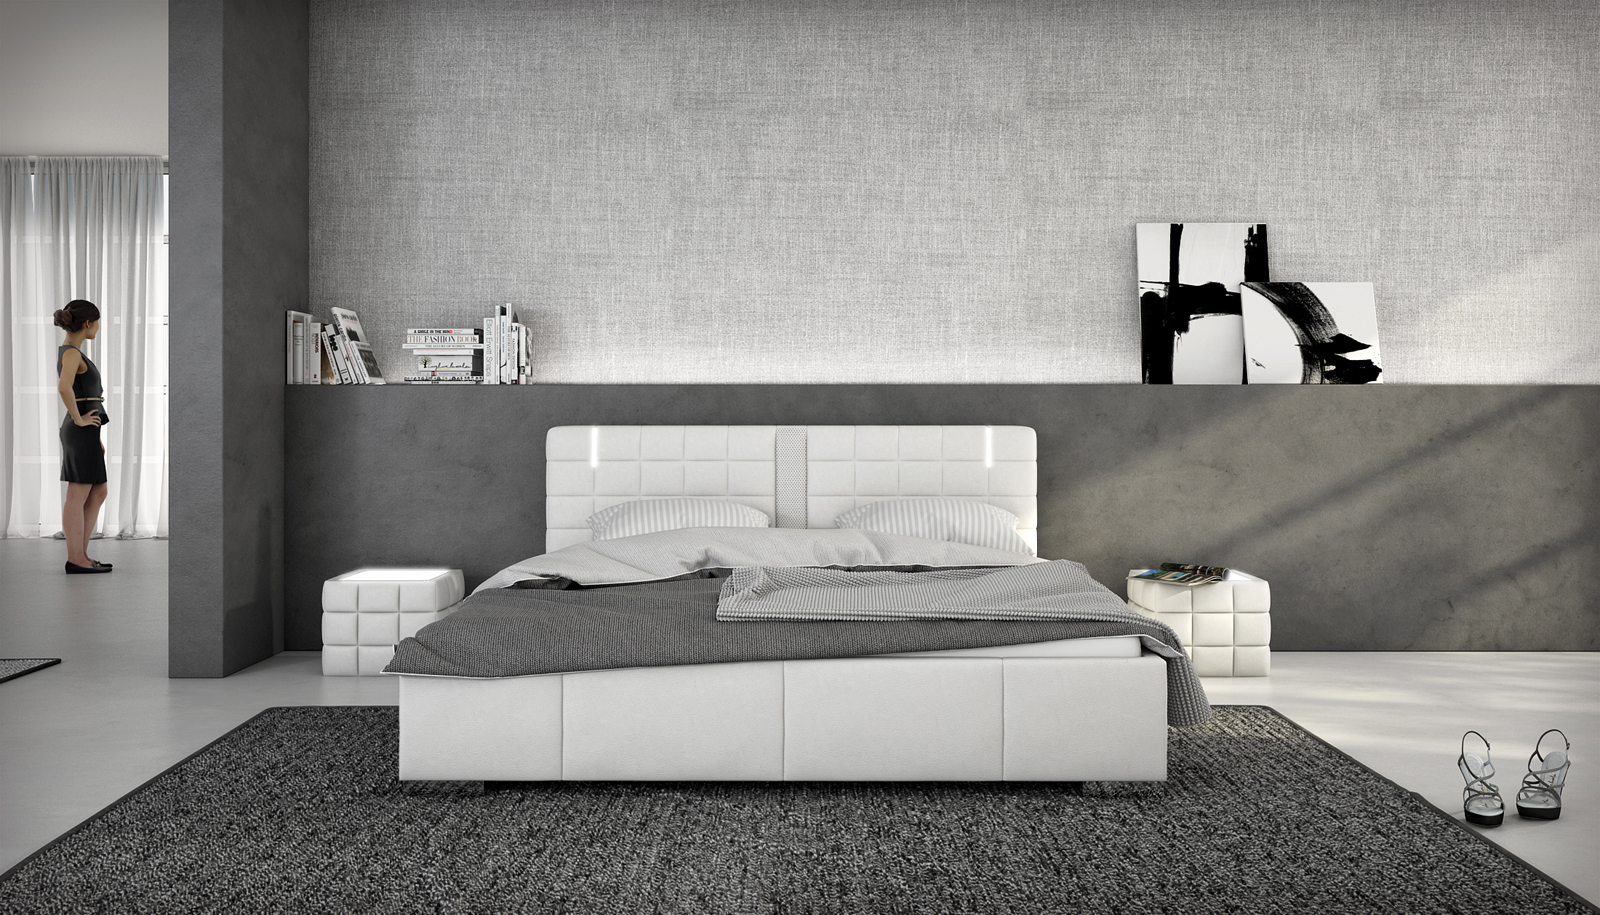 sam polsterbett 180 x 200 cm soundsystem wei cuenca auf. Black Bedroom Furniture Sets. Home Design Ideas